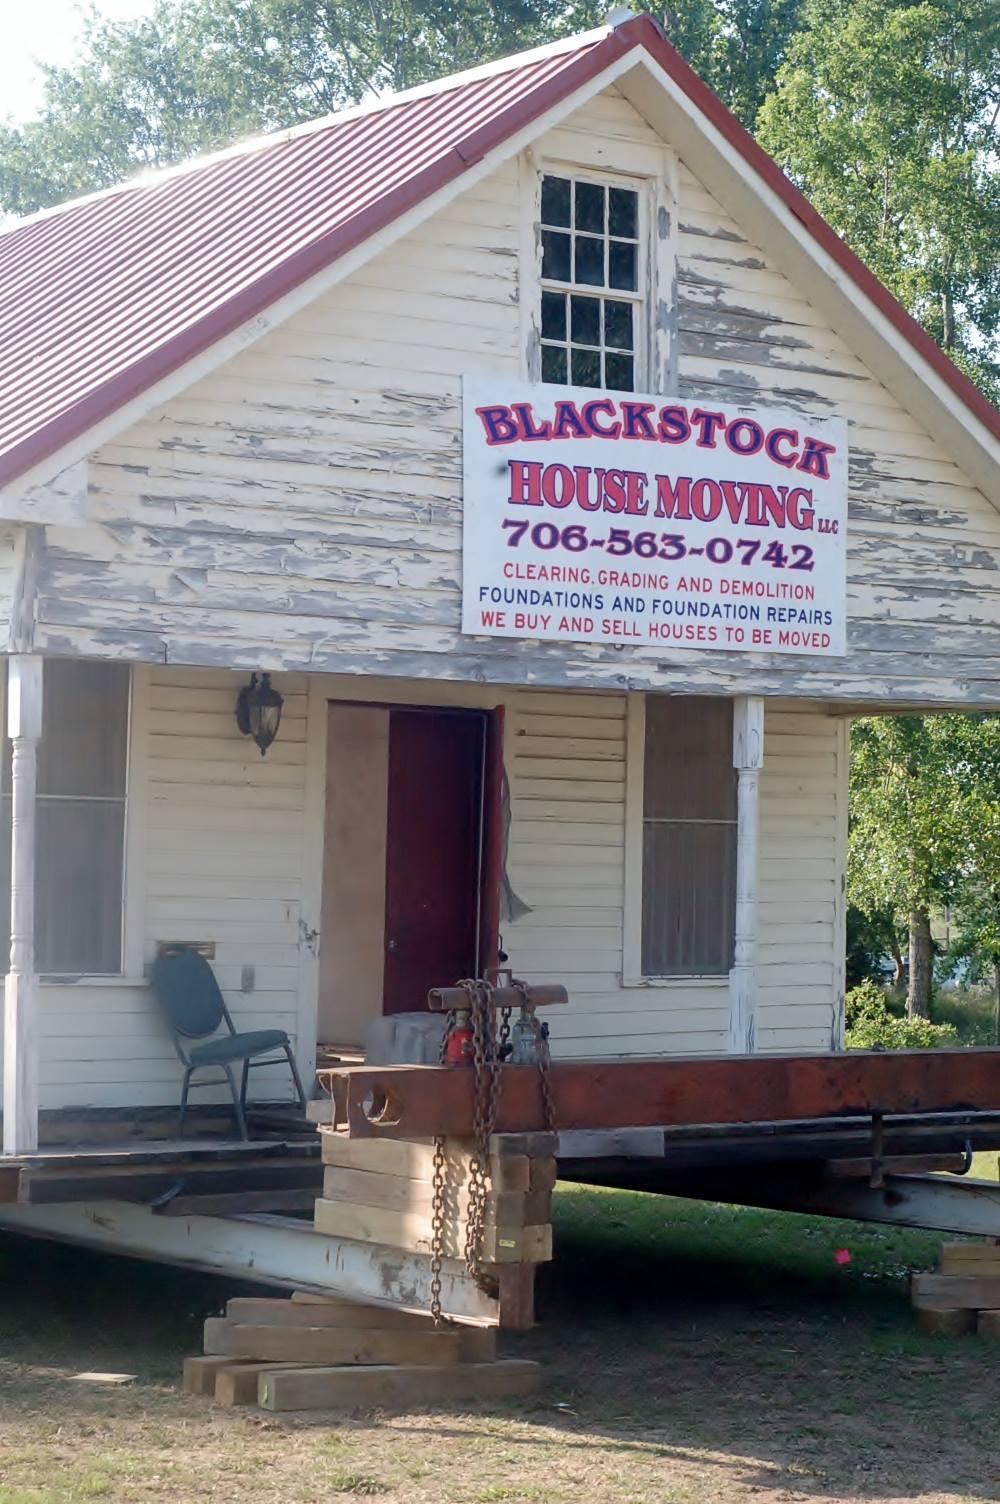 The historic Jones Family Store